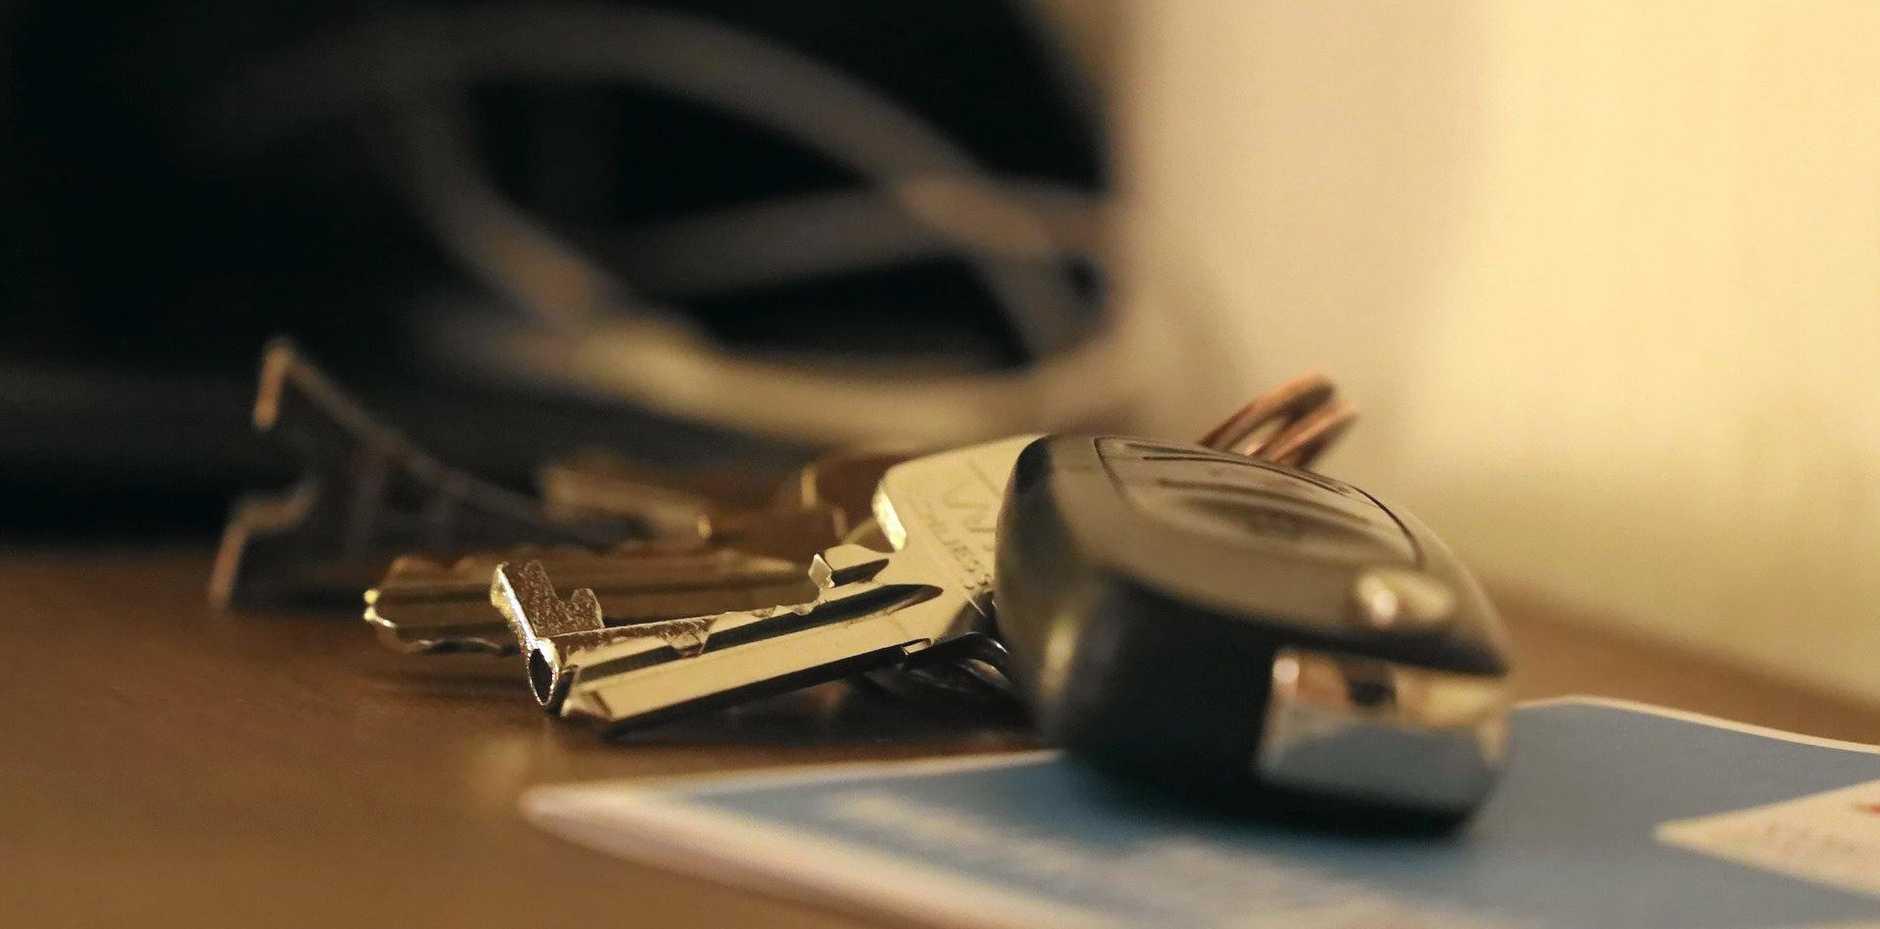 Keys to the minibus were stolen during the burglary.